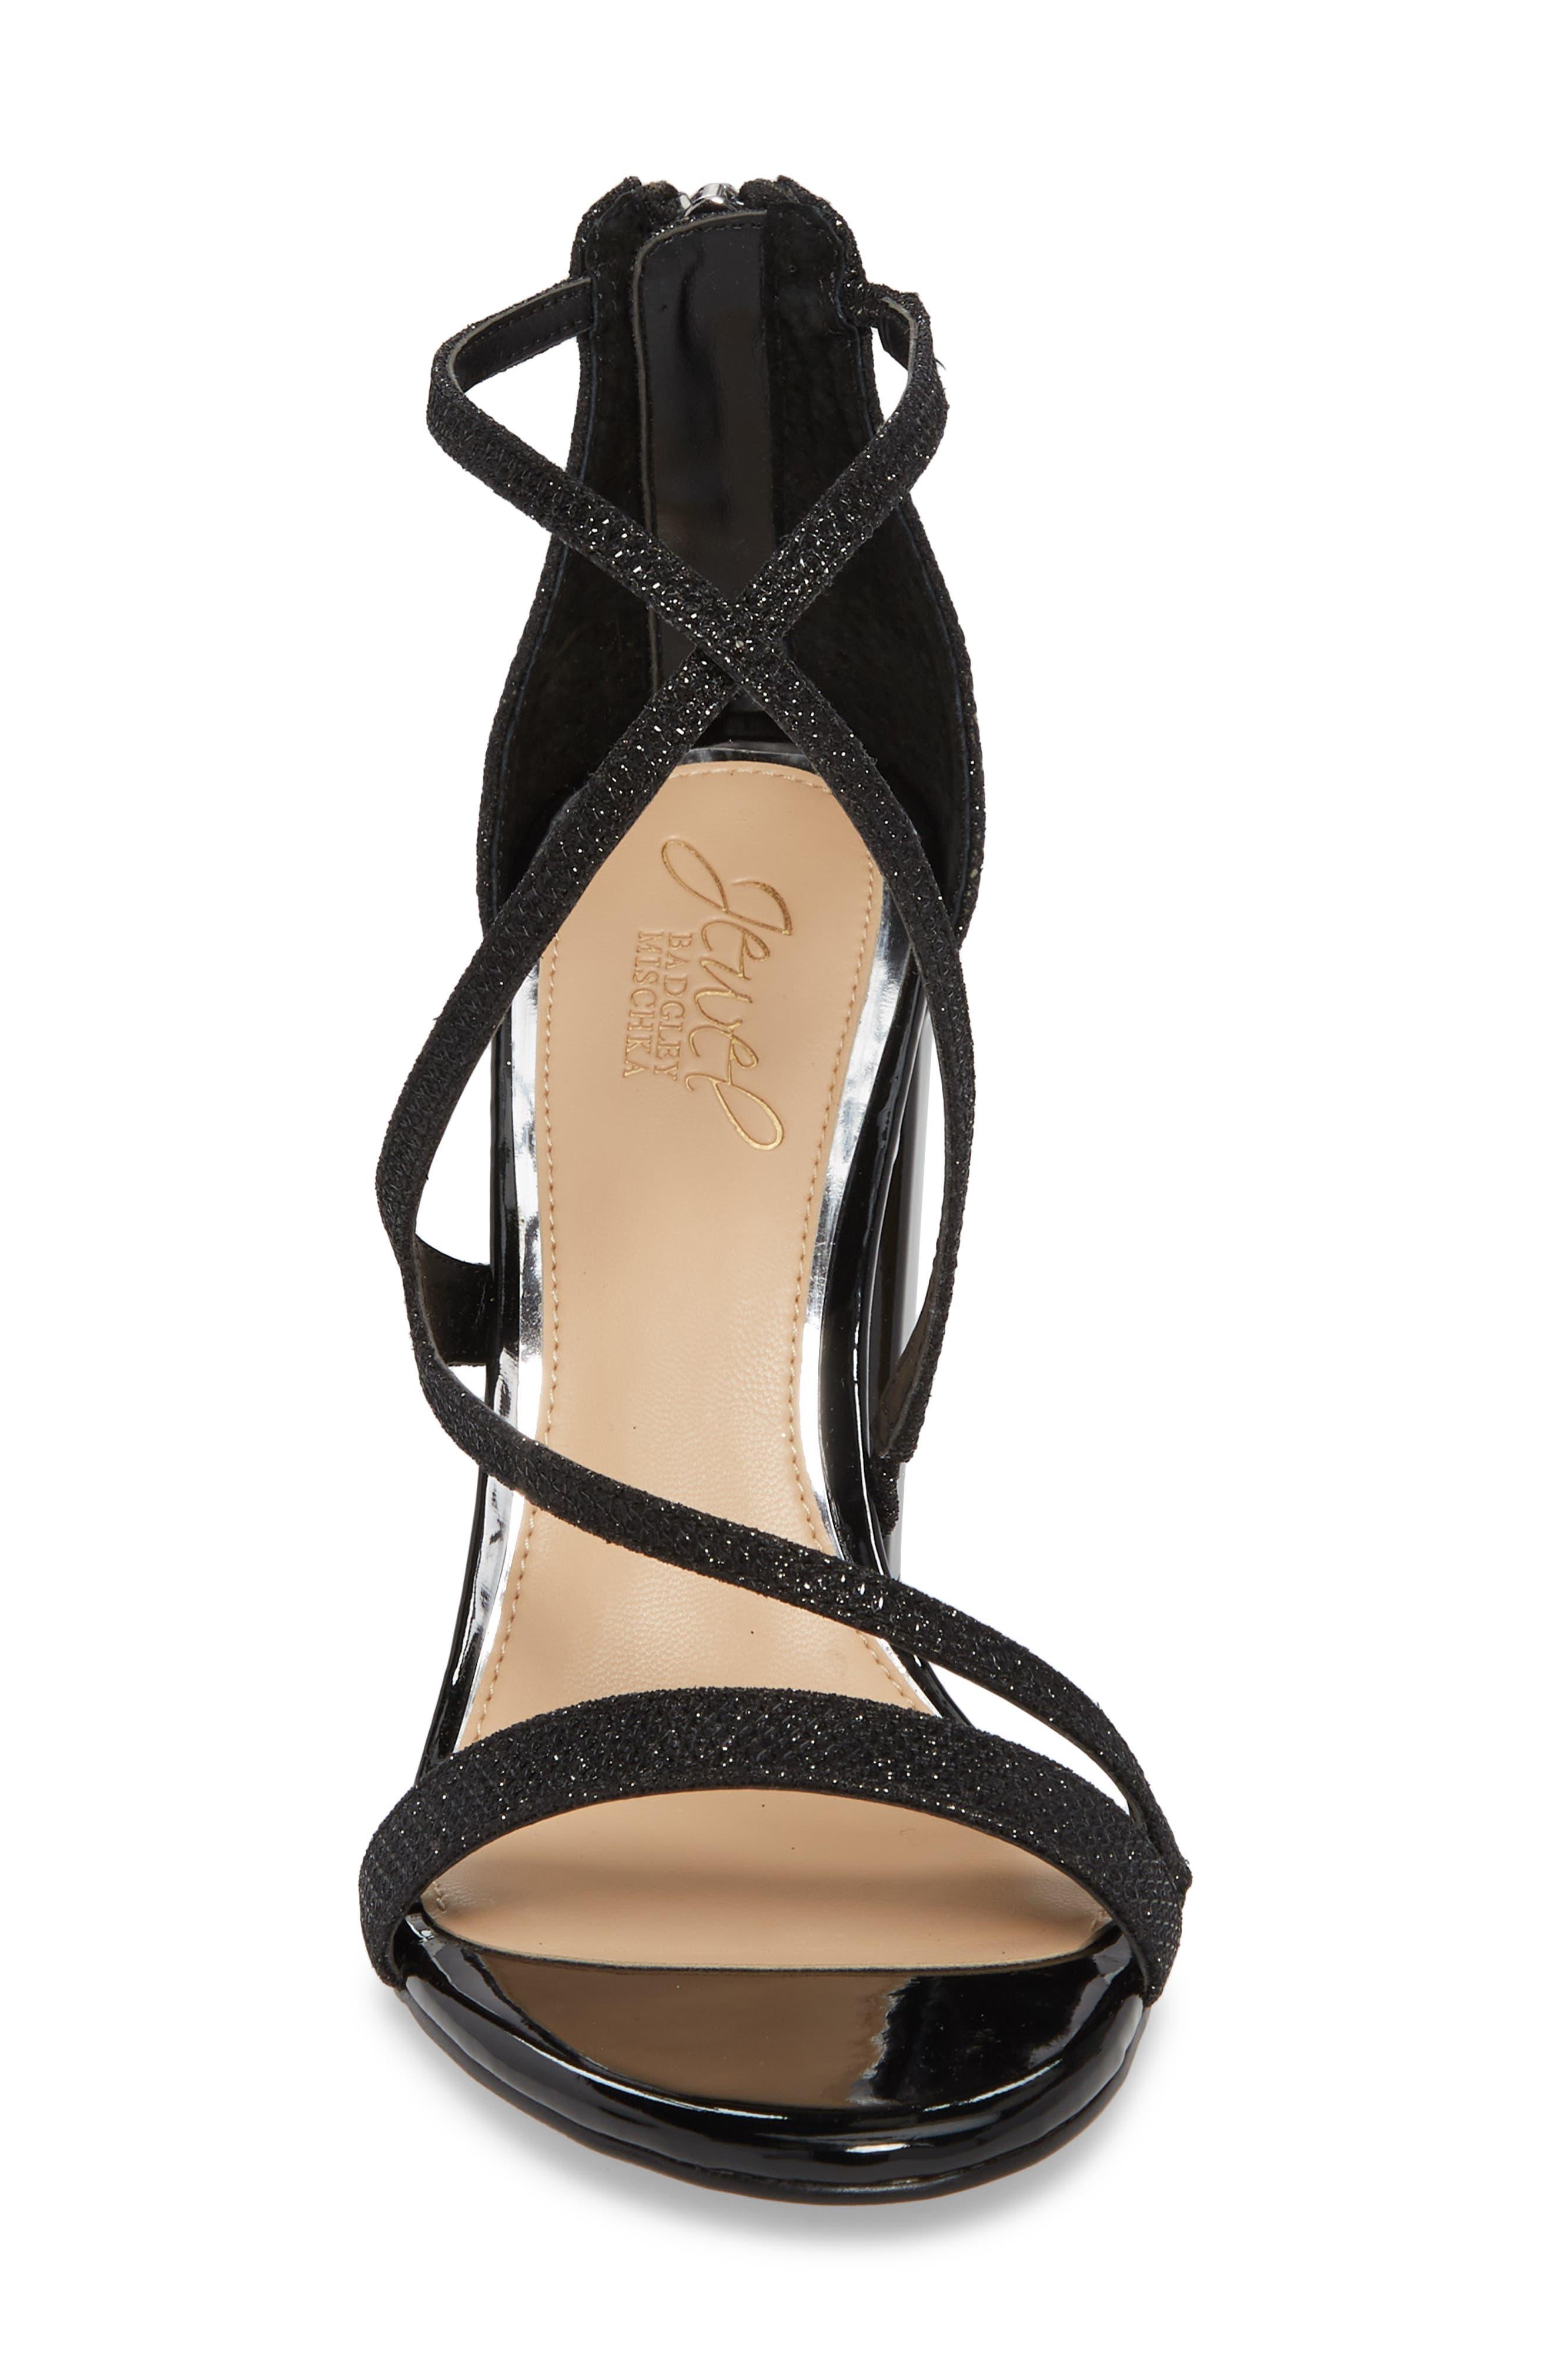 Badgley Mischka Gale Block Heel Sandal,                             Alternate thumbnail 4, color,                             BLACK GLITTER FABRIC